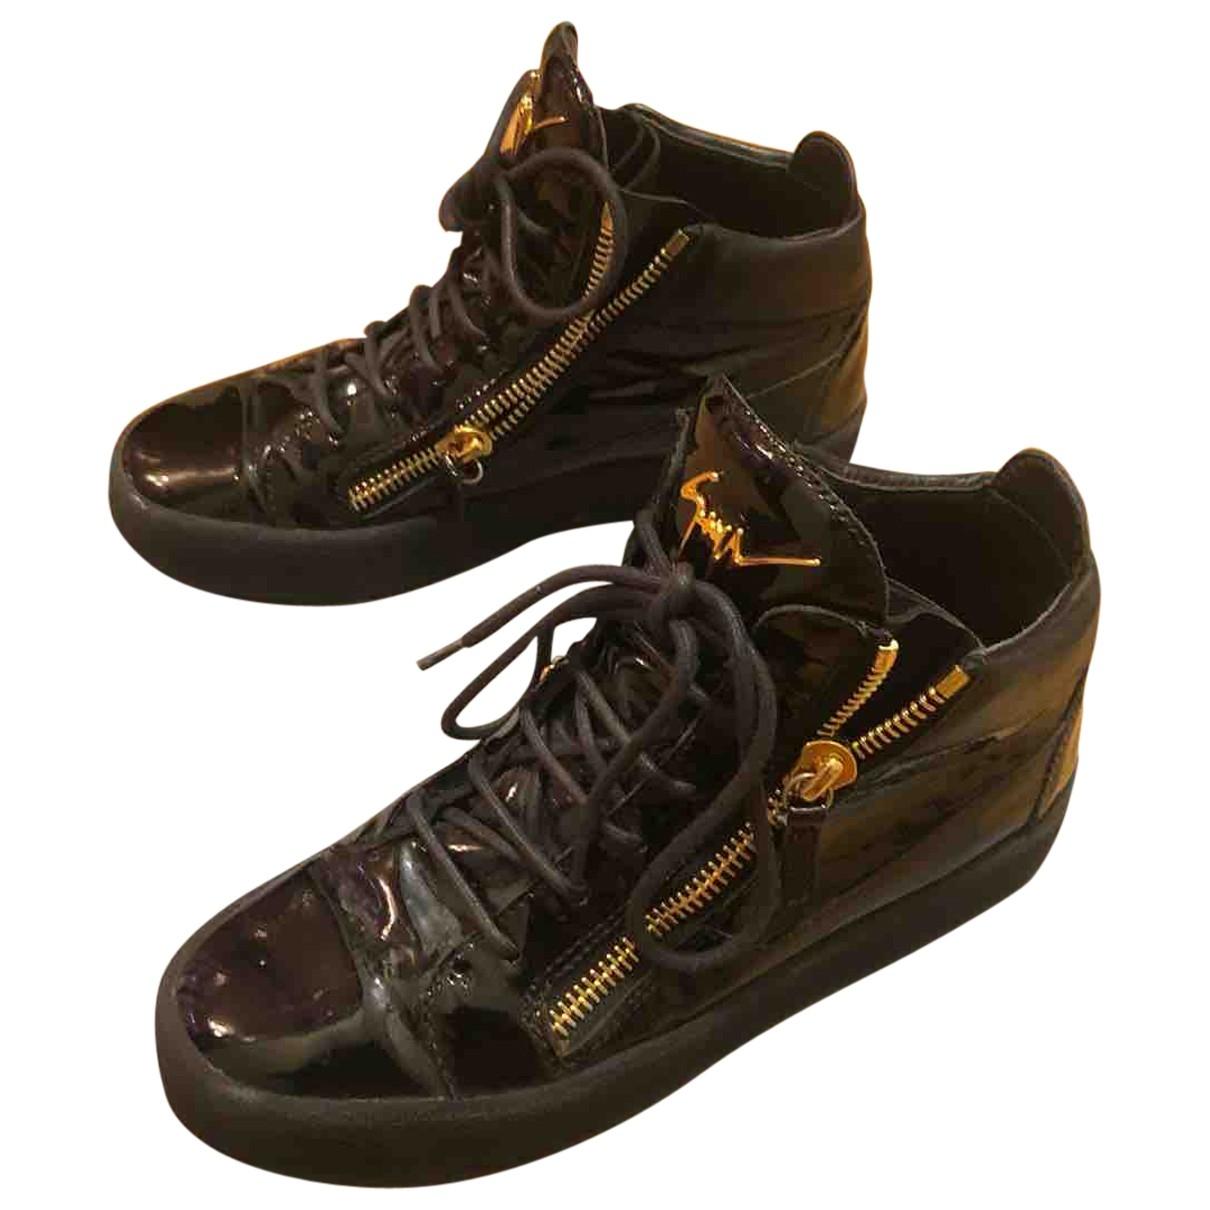 Giuseppe Zanotti - Baskets Nicki pour femme en cuir verni - noir